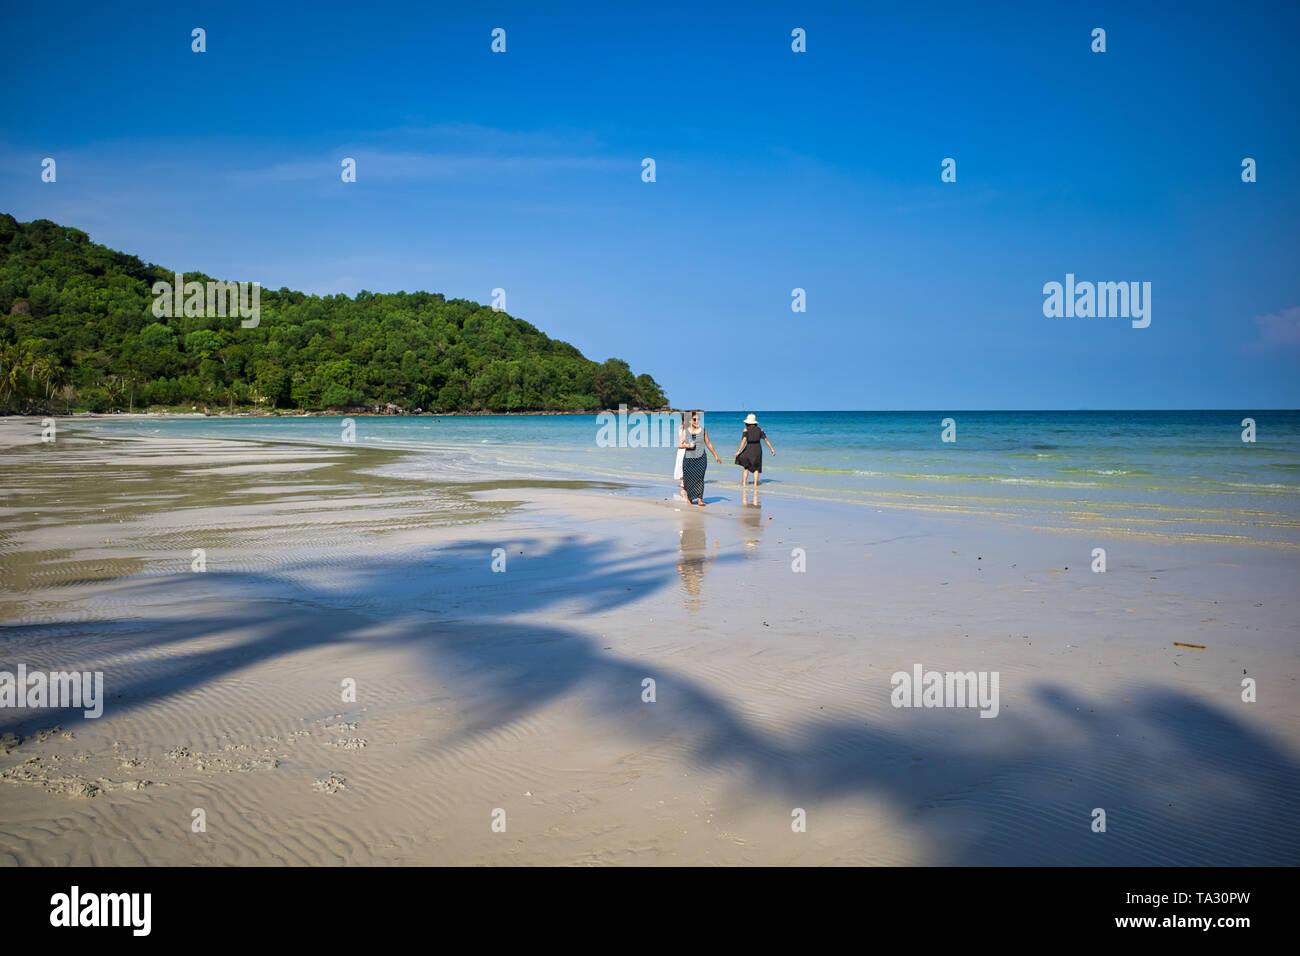 Phu Quoc island, Vietnam - March 31, 2019: White sand beach, sea horizon. Calm sea and girls walking on the beach. Coast of the South China Sea - Stock Image